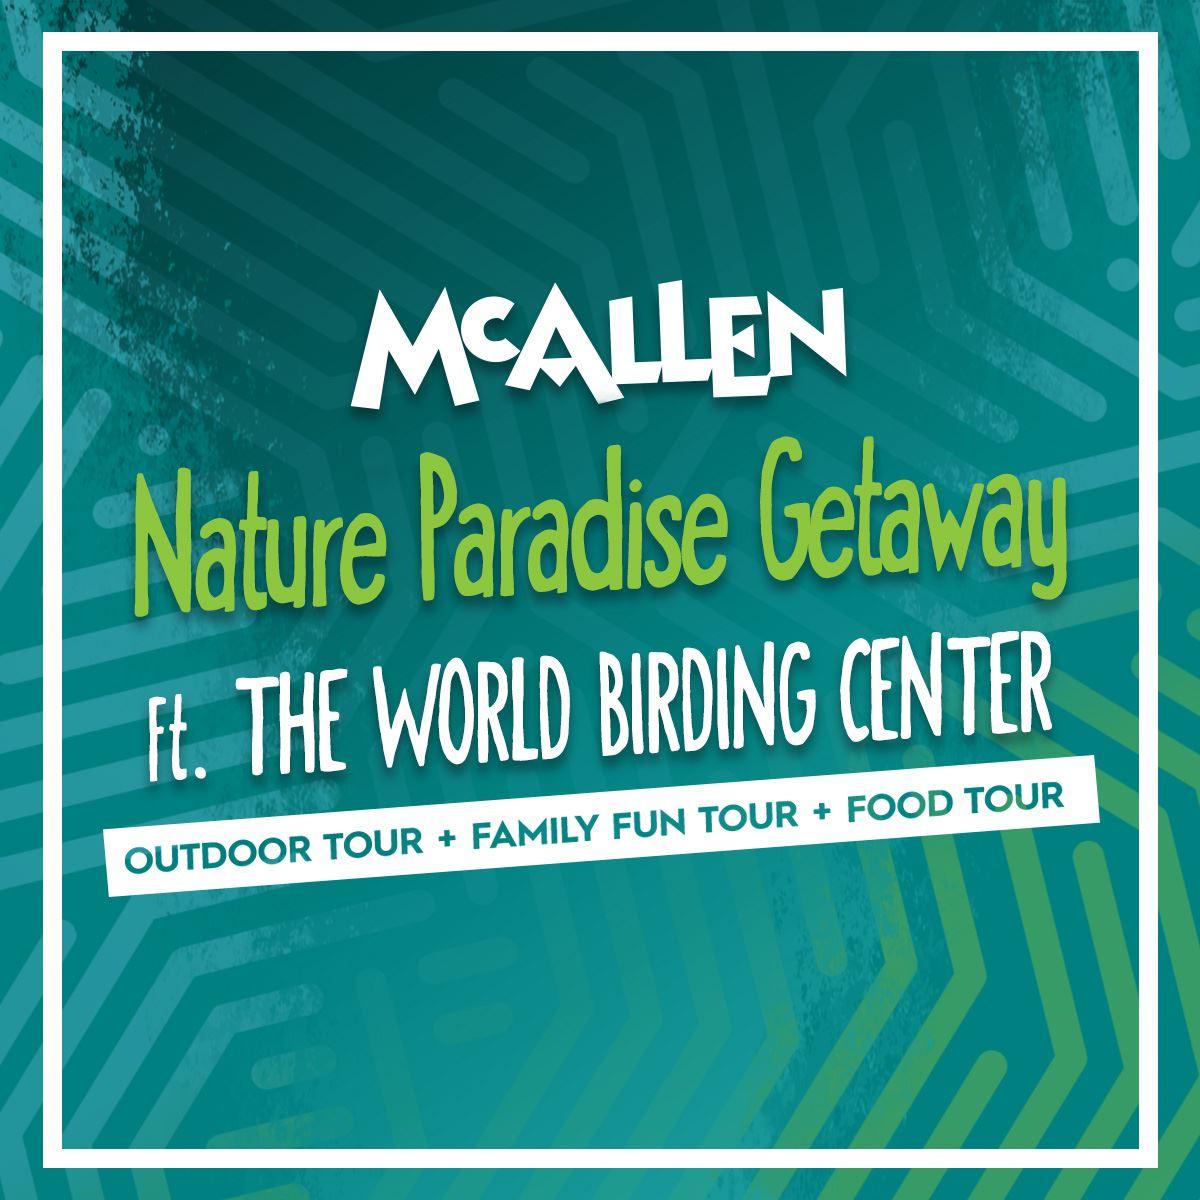 Nature Paradise Getaway